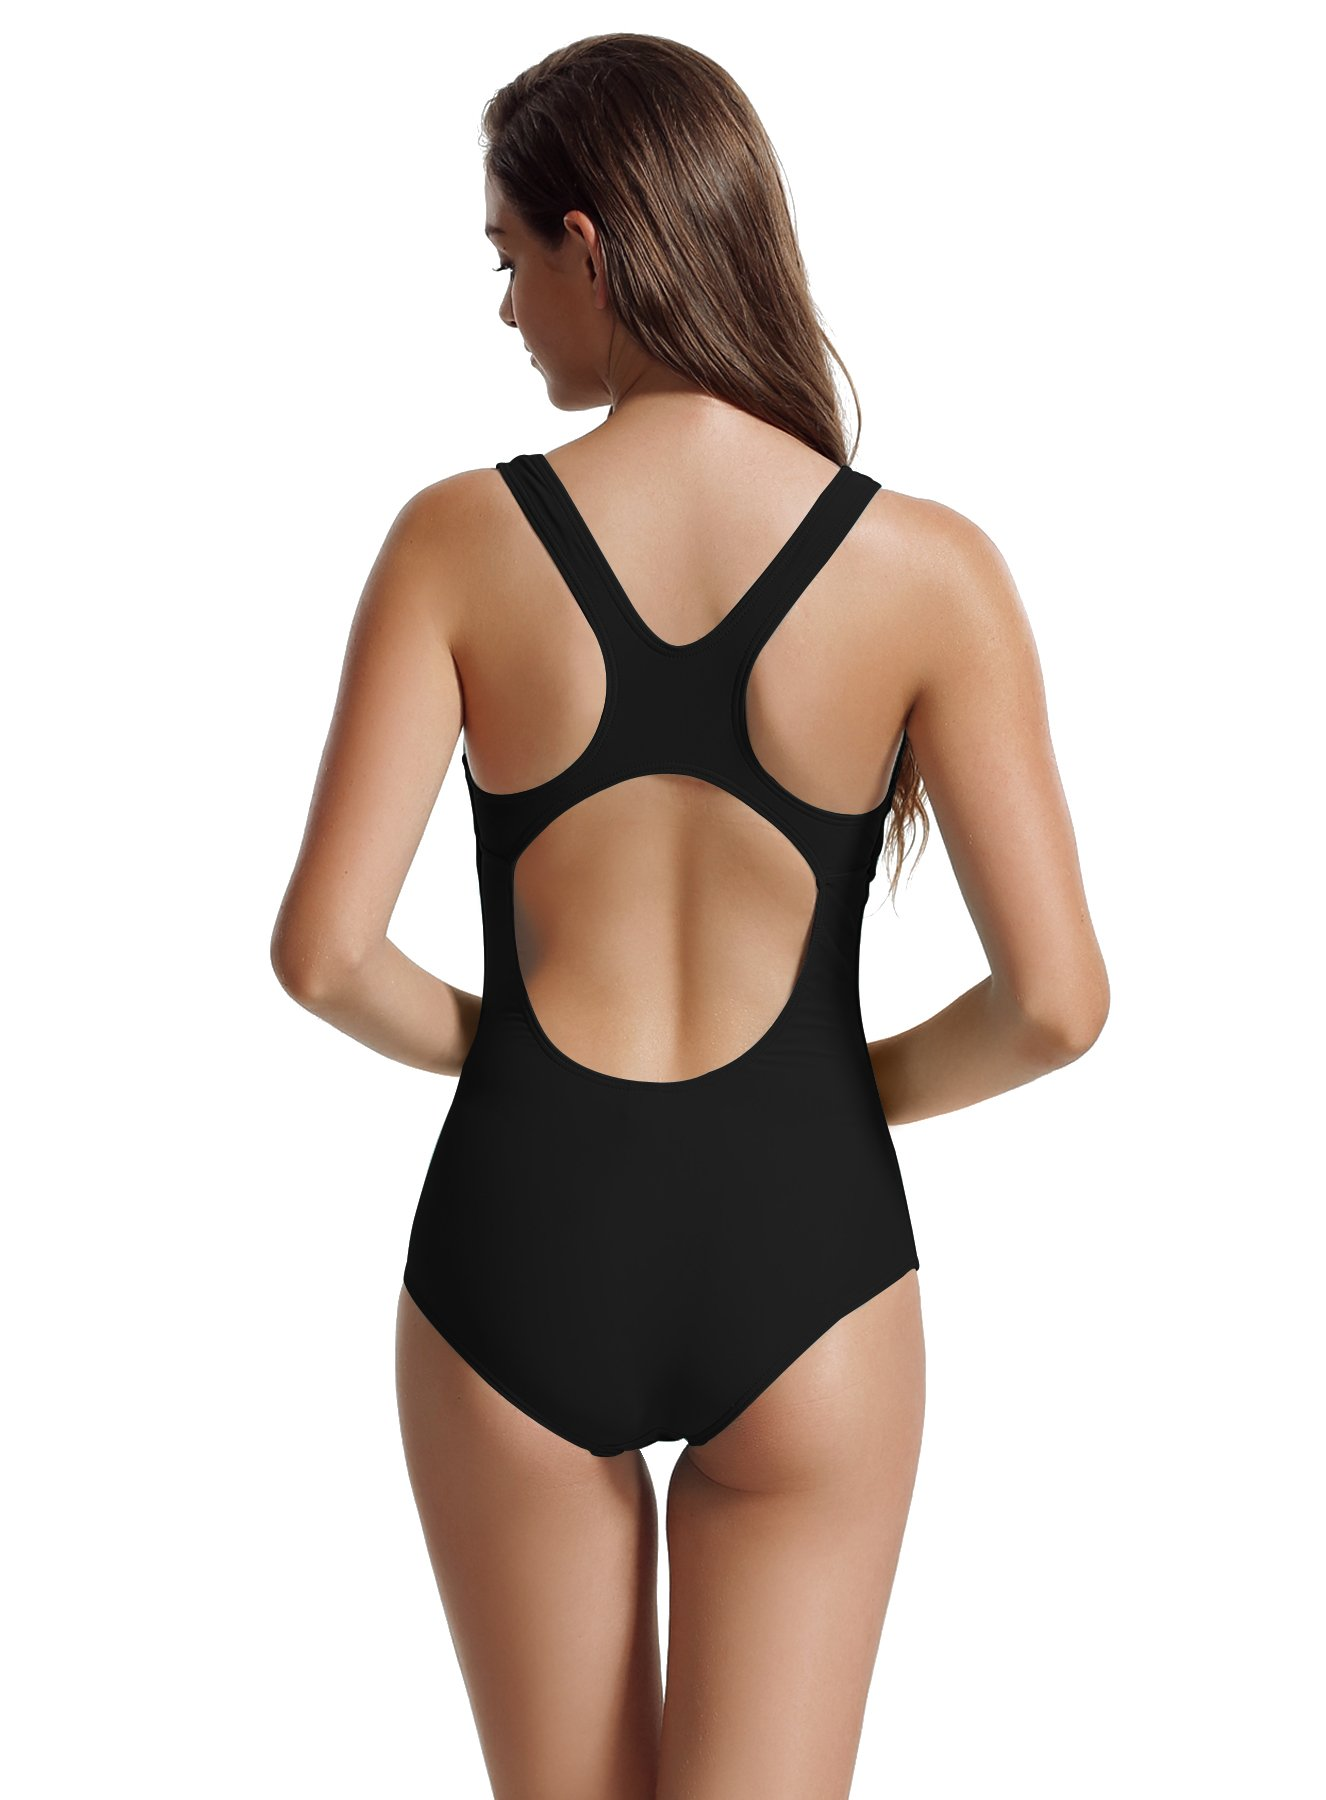 zeraca Women's Sport Racerback One Piece Swimsuits (M10, Black) by zeraca (Image #4)